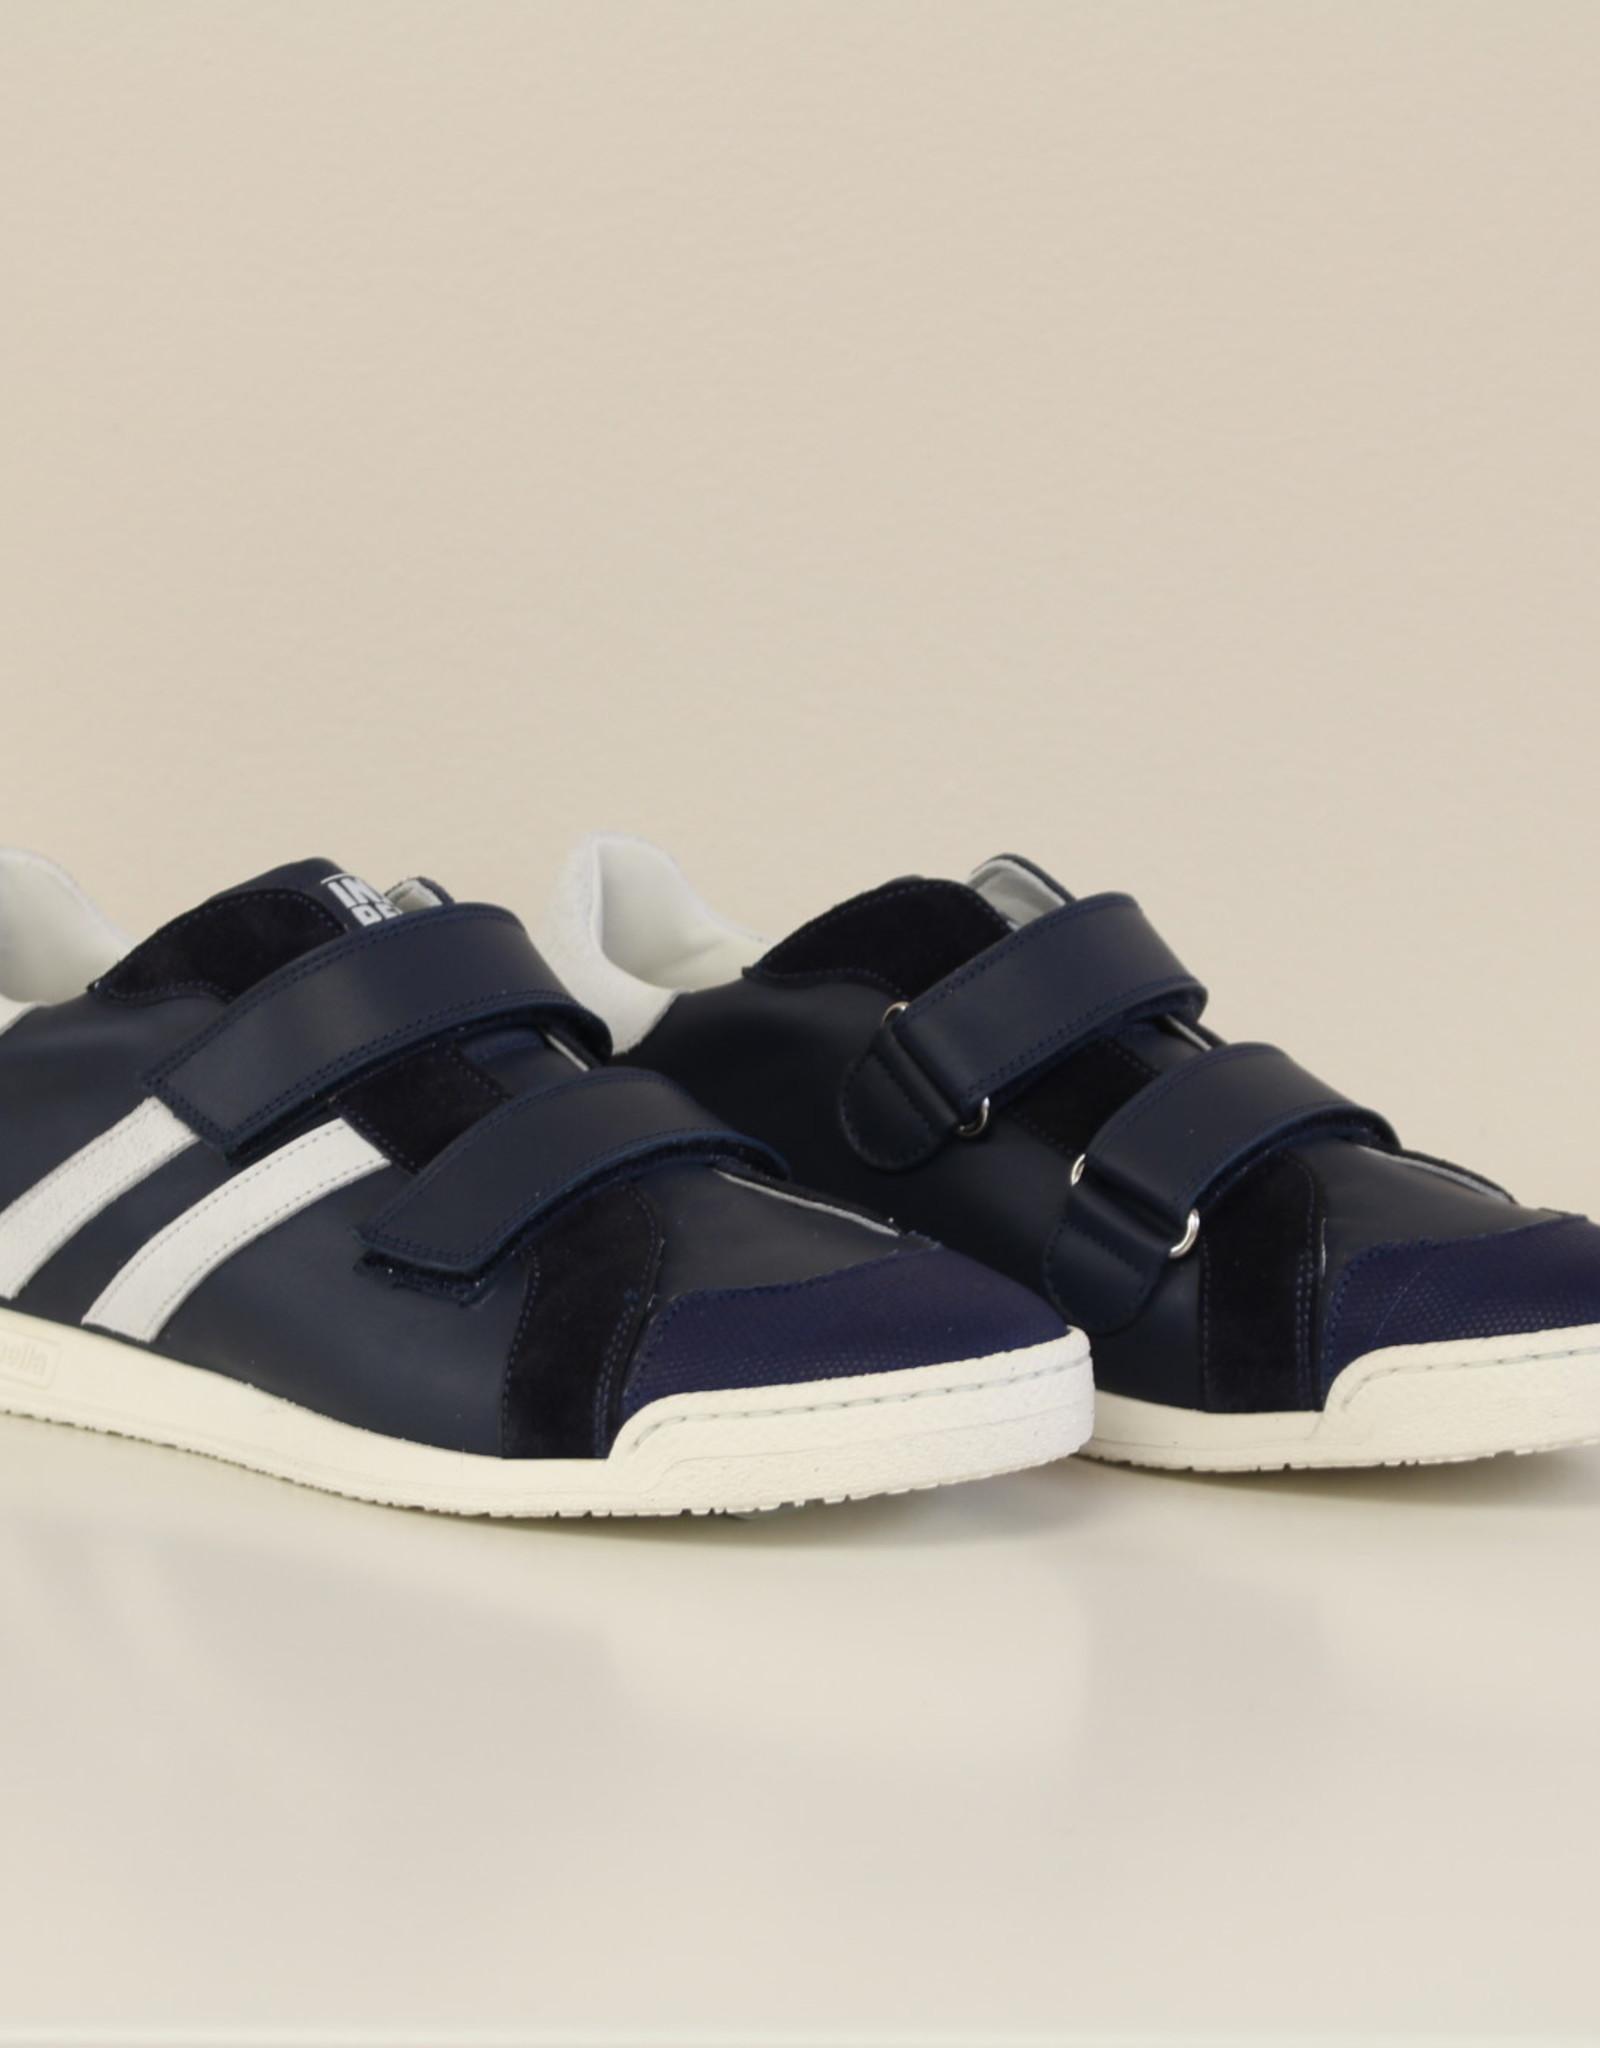 Rondinella 11298 donkerblauwe sneaker velcro